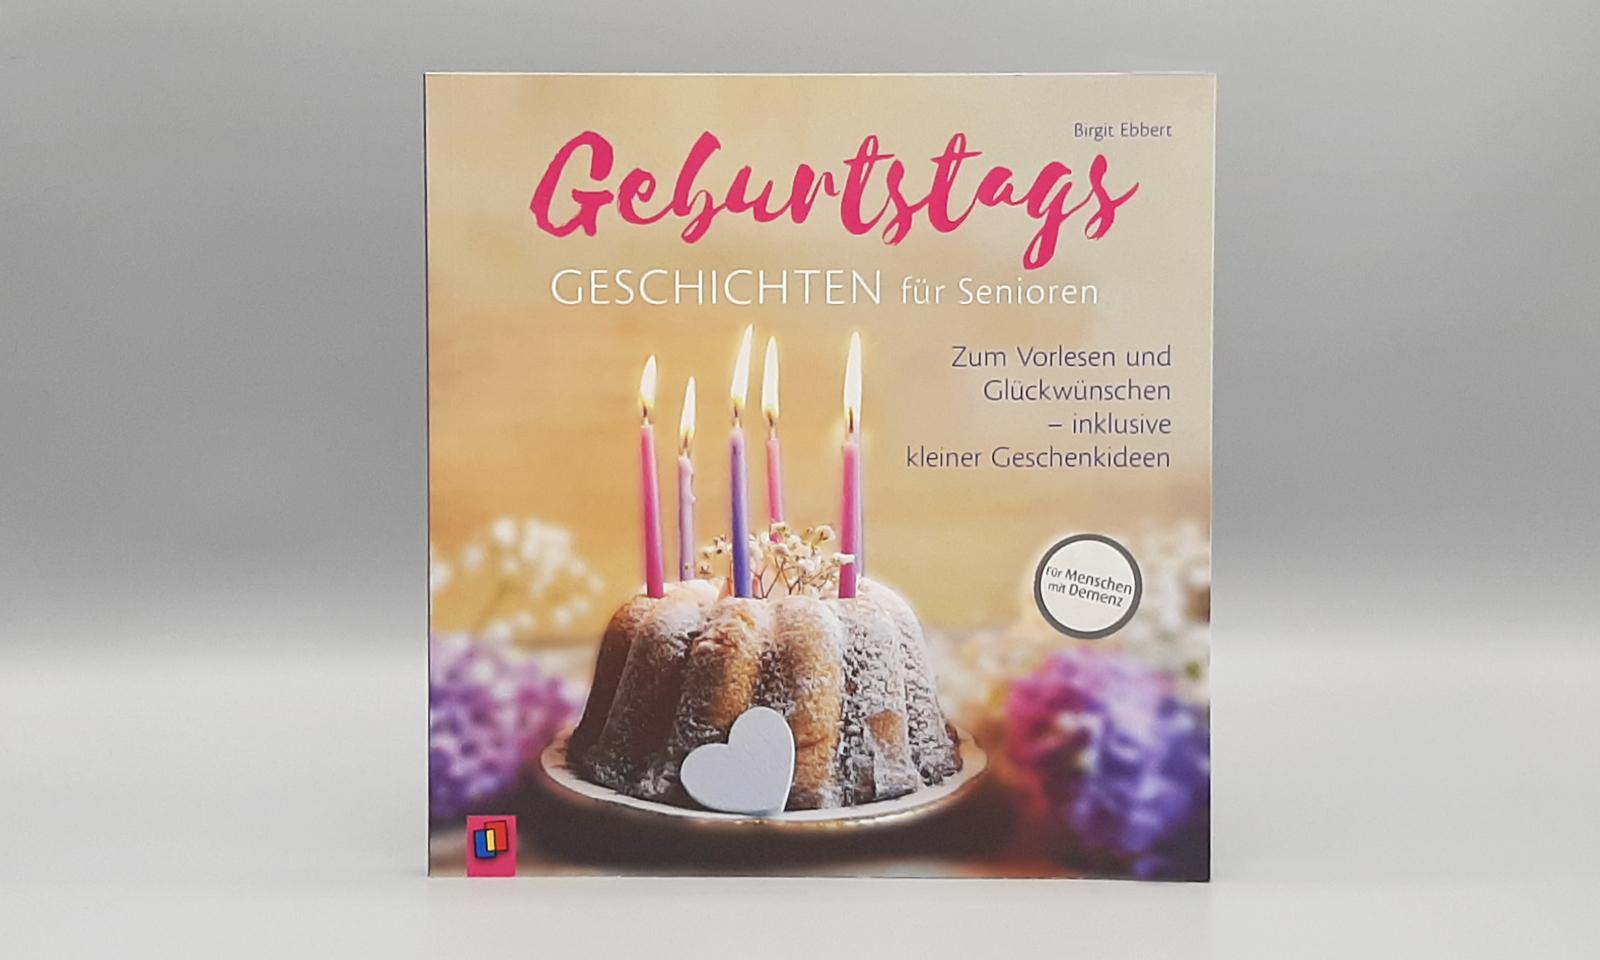 Geburtstagsgeschichten2